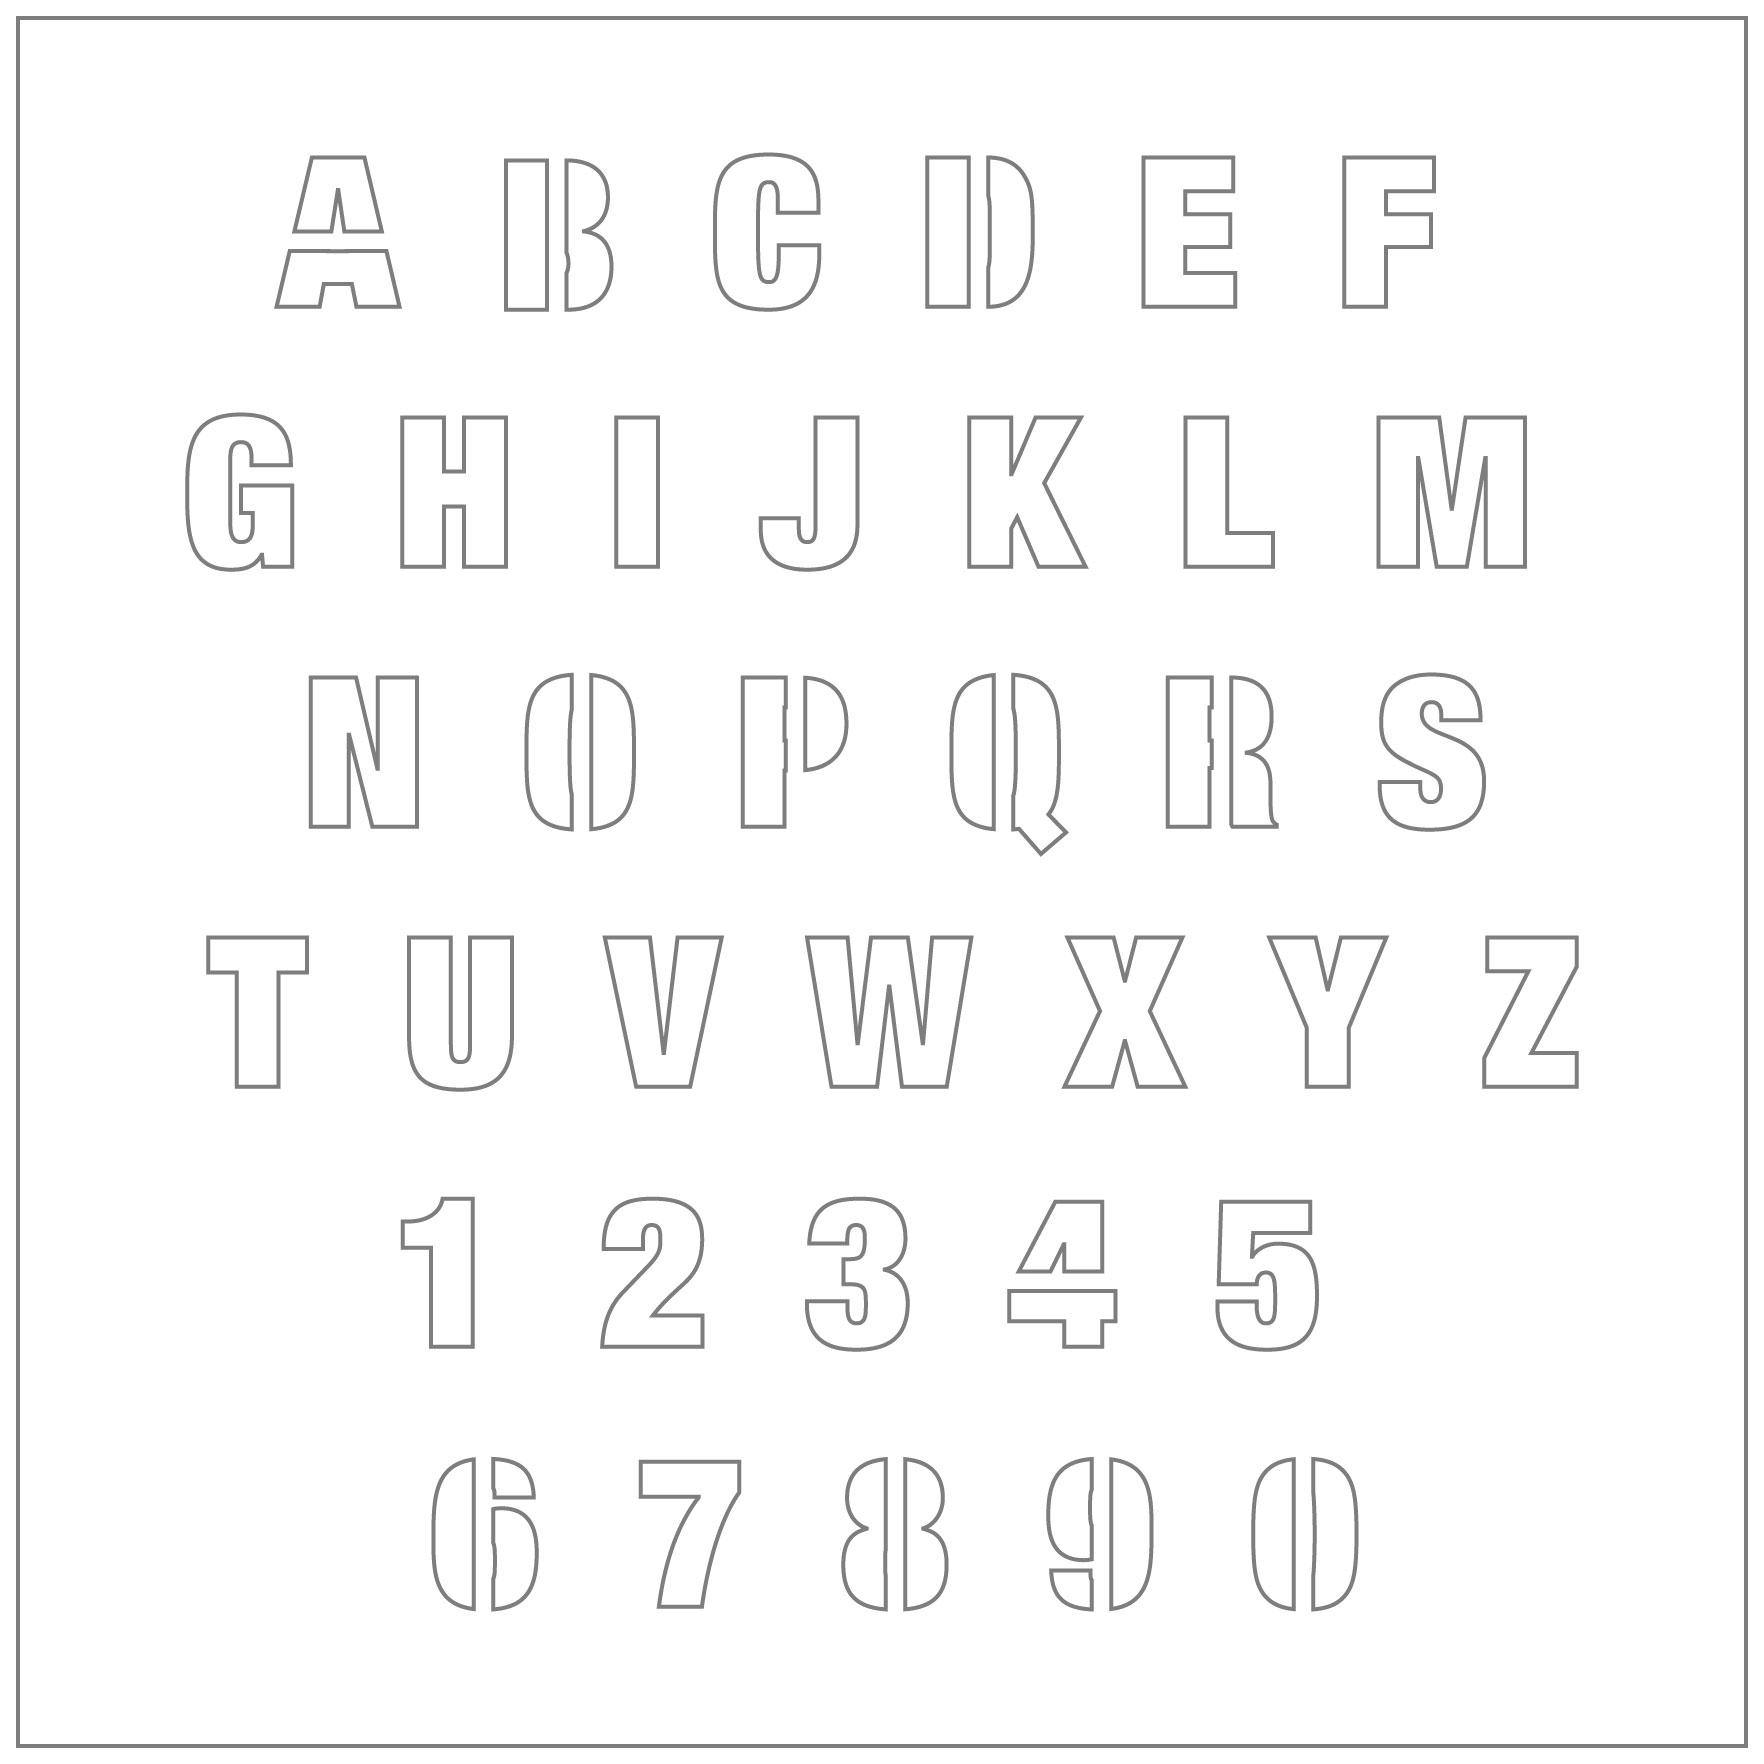 stencil-letters-numbers2.jpg